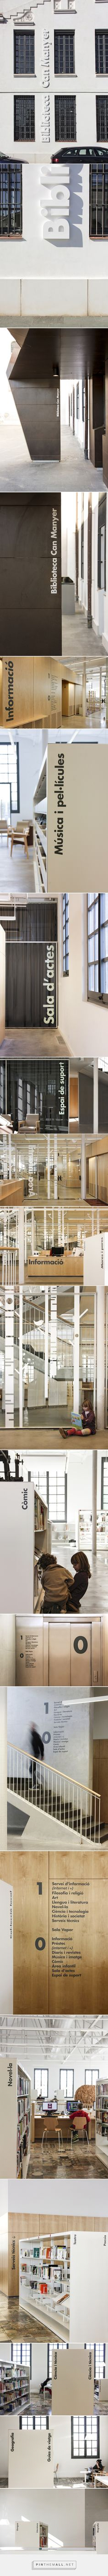 Biblioteca Can Manyer | PFP, disseny gràfic - created via https://pinthemall.net